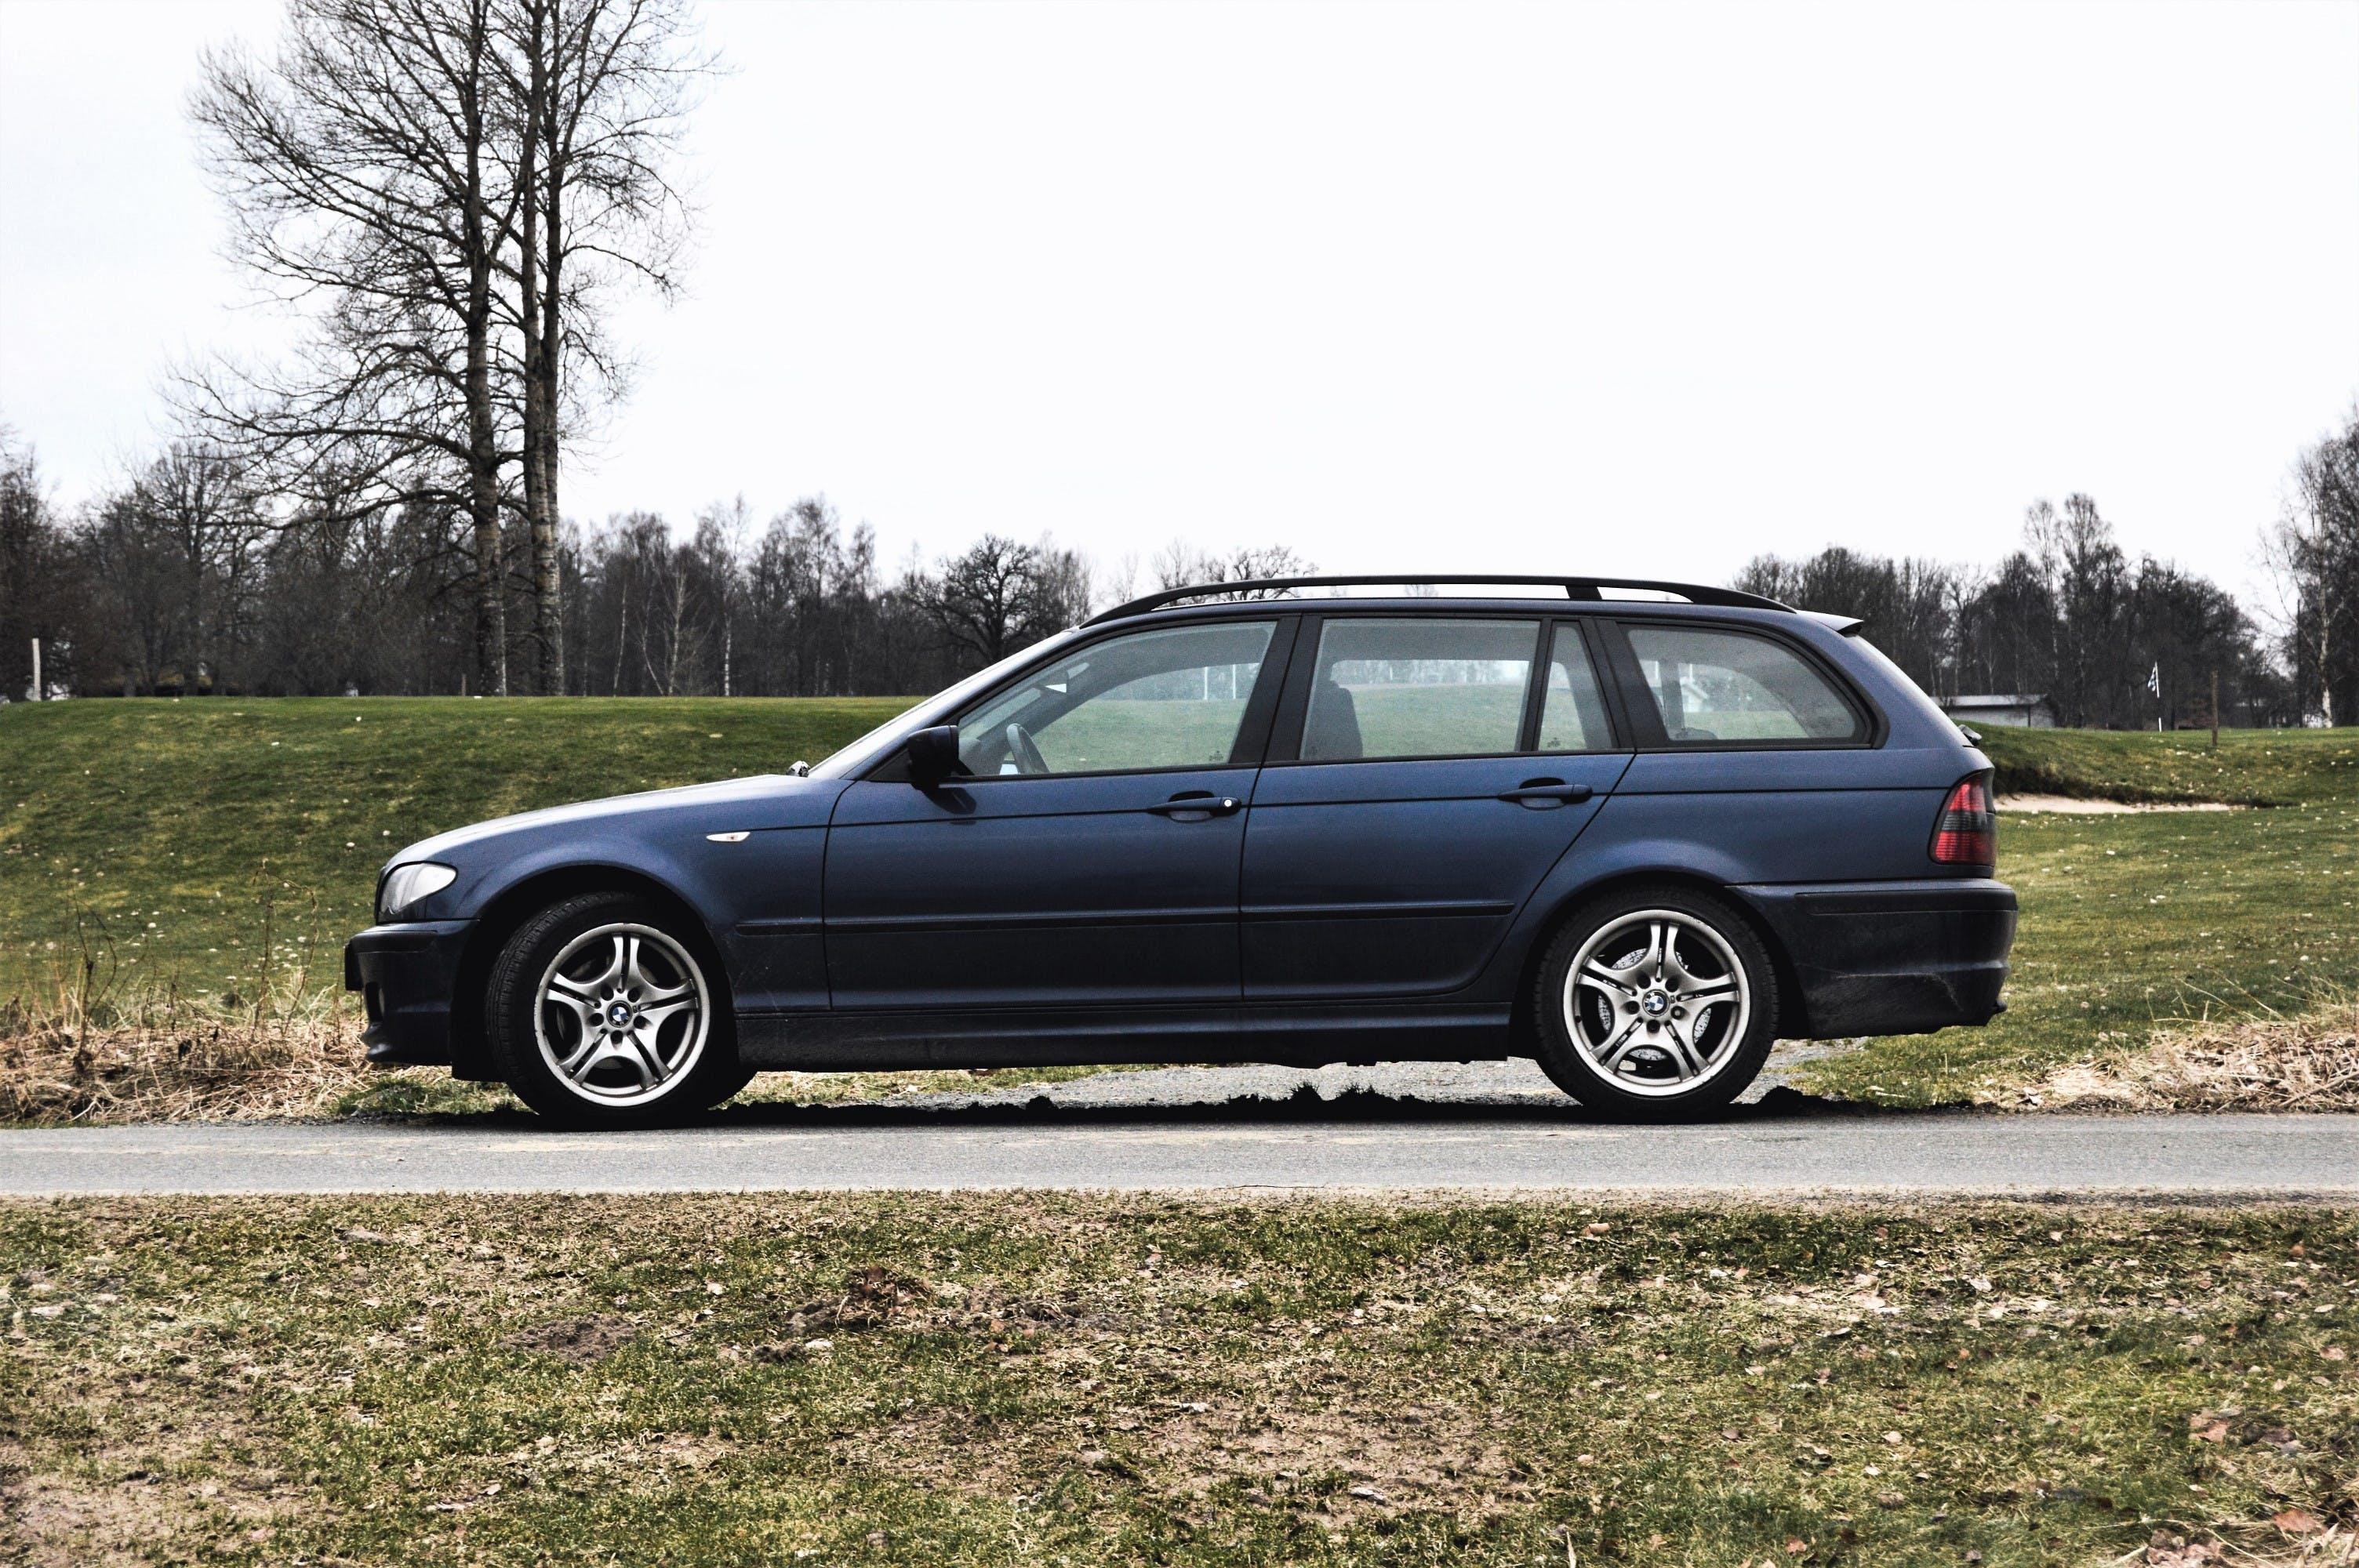 2003, auto, blue